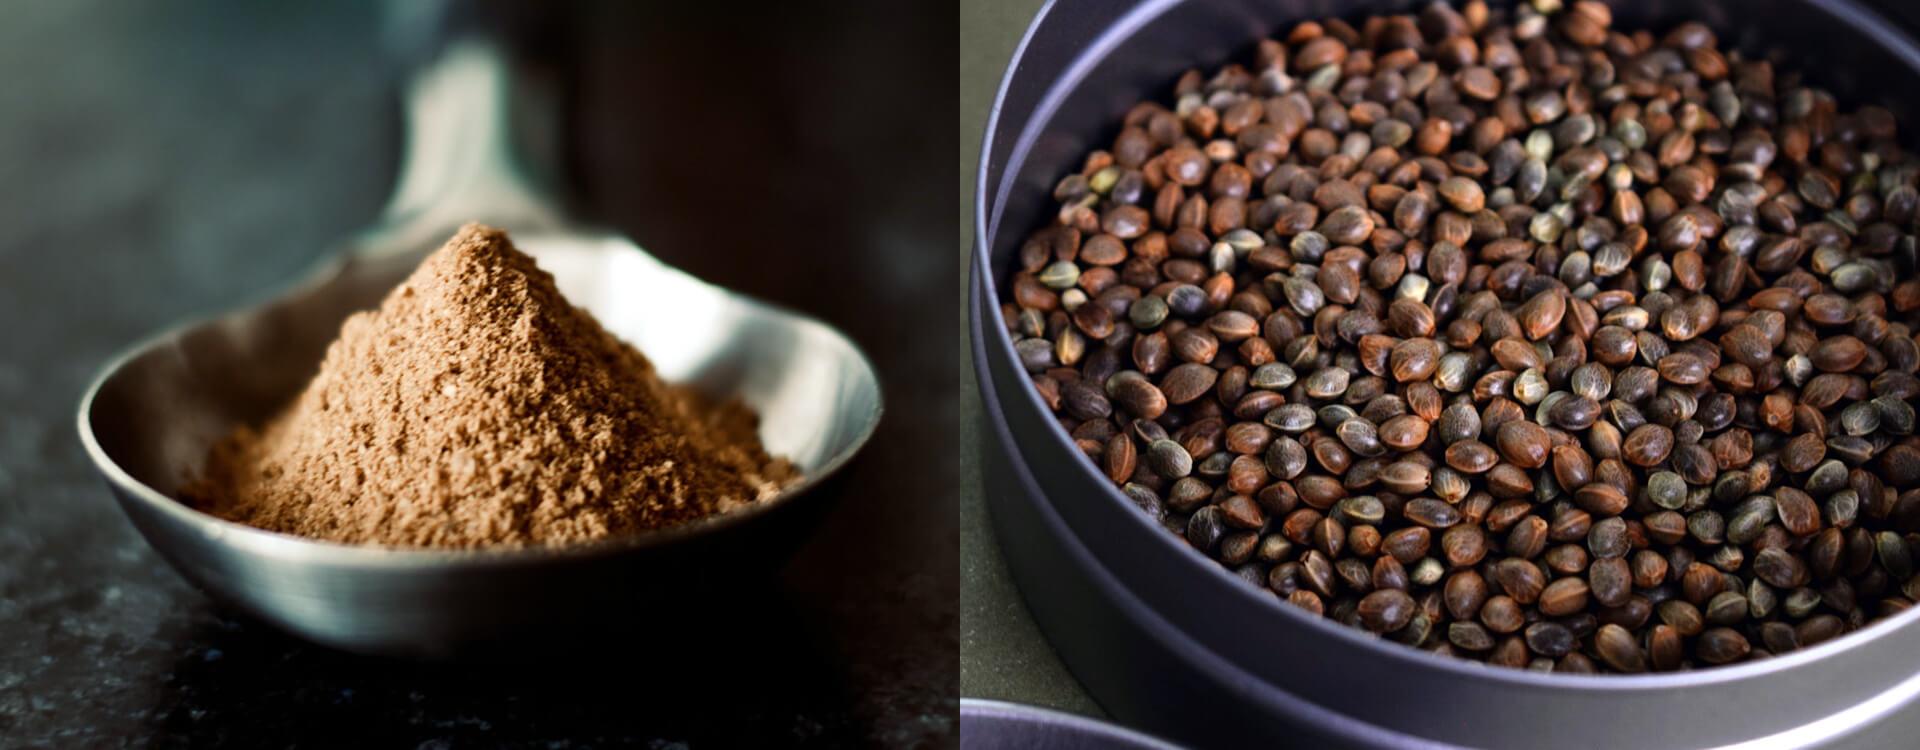 Konopný proteín a konopné semená